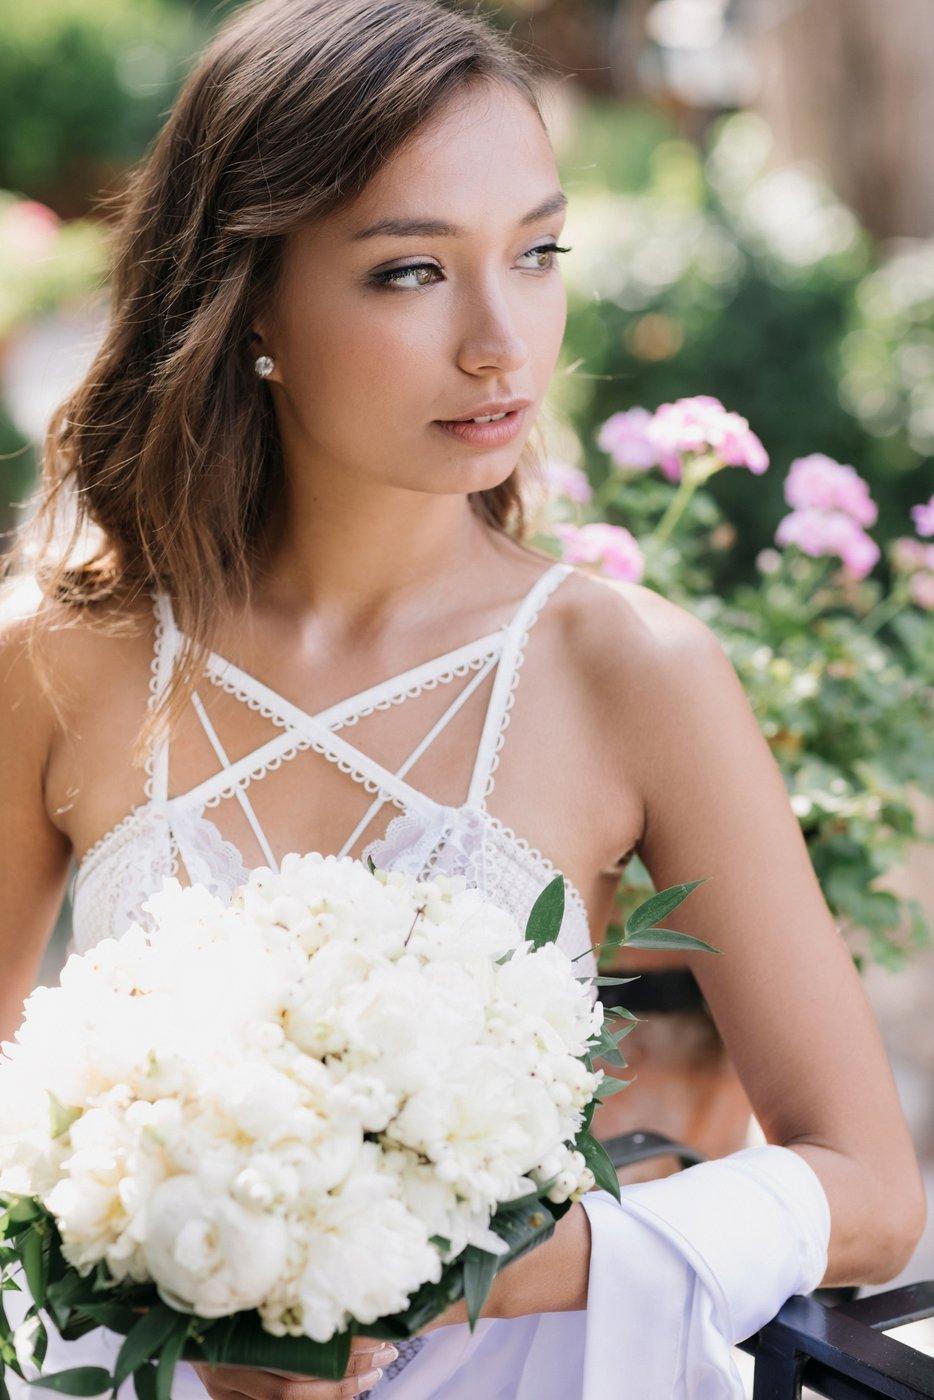 Alex Maria September 16 2017 Taormina Italy-Bride s Groom s Preparatio-0036.jpg